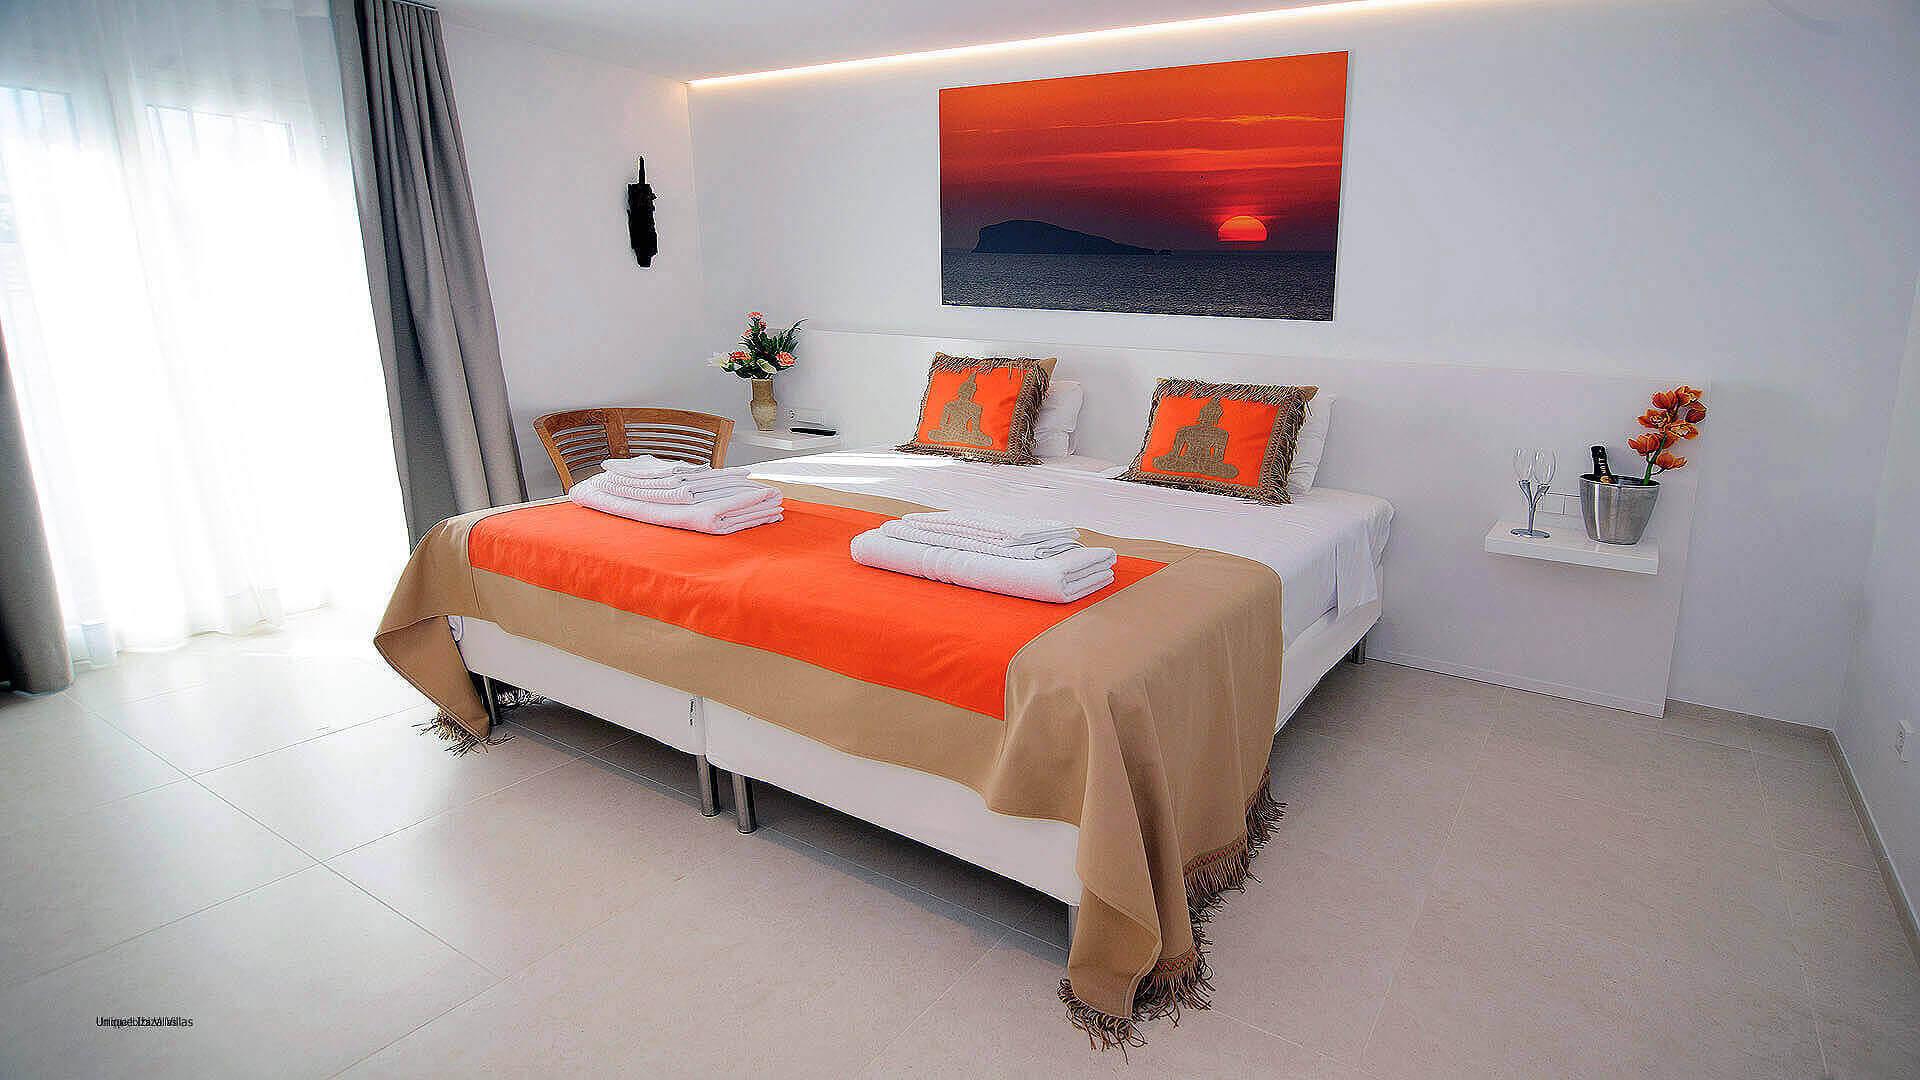 Sa Plana De Baix Ibiza 38 Bedroom 3